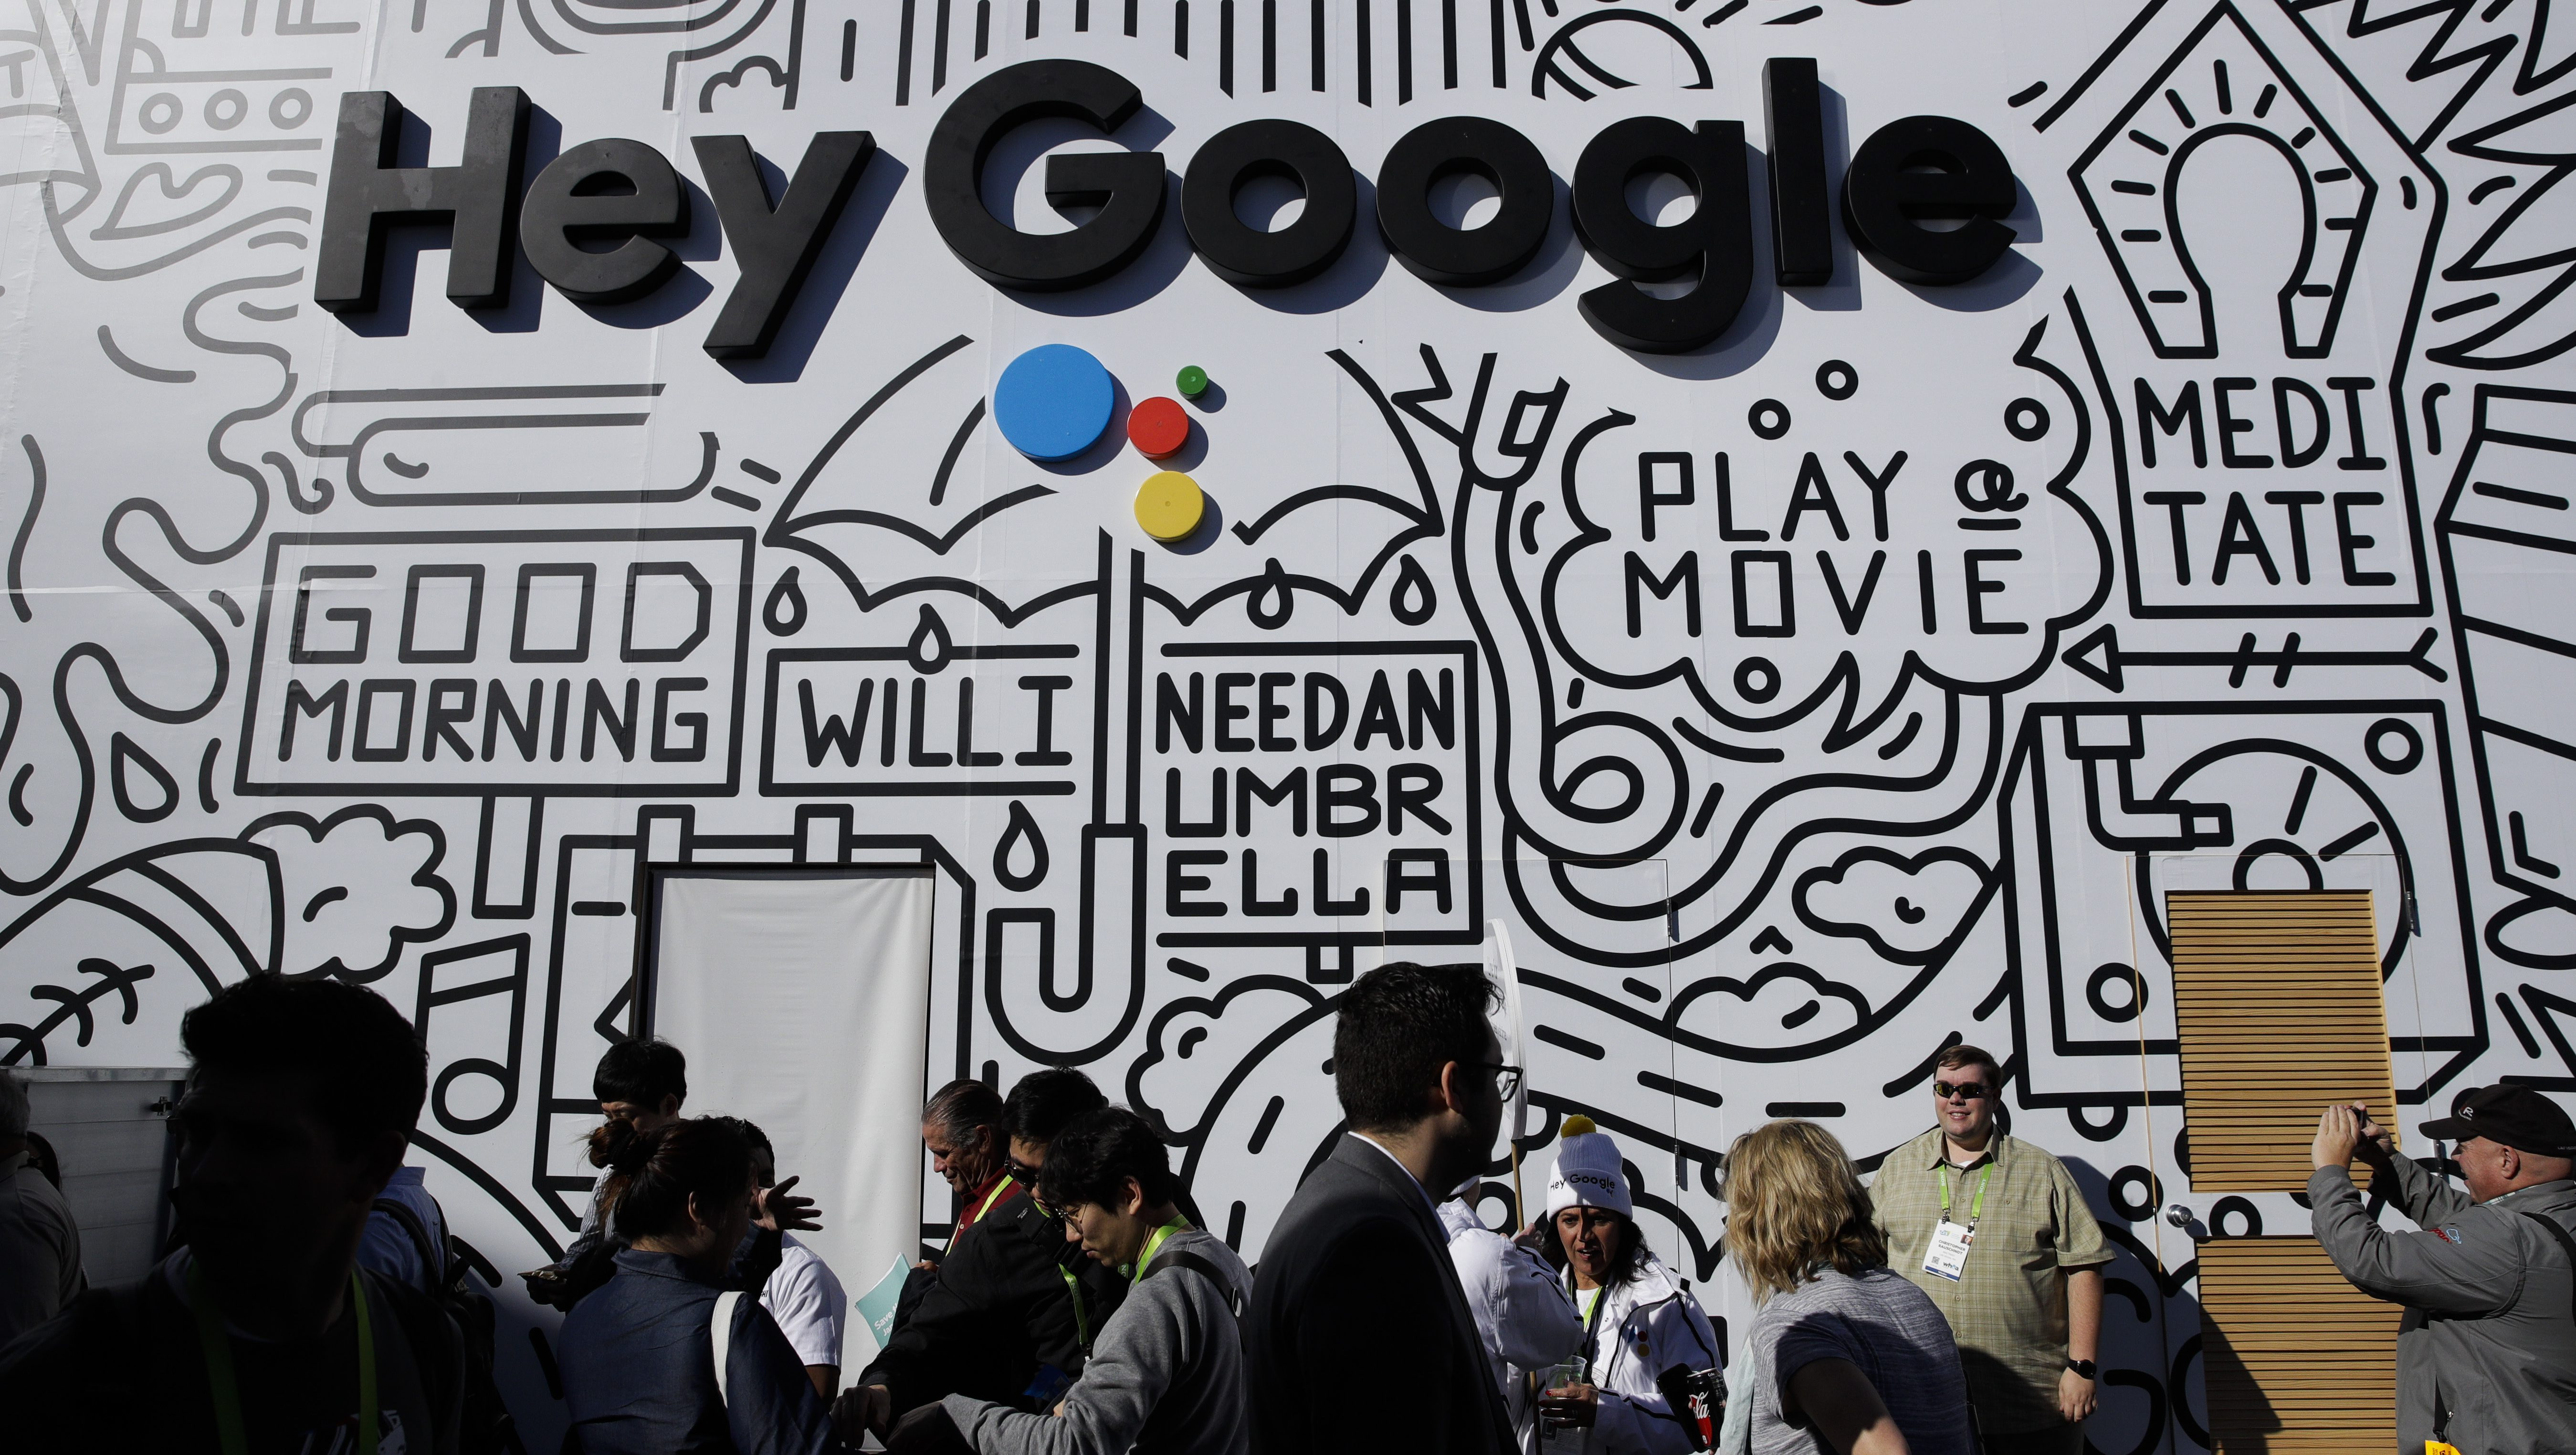 People wait in line to enter the Google booth at CES International, Wednesday, Jan. 10, 2018, in Las Vegas. (AP Photo/Jae C. Hong)